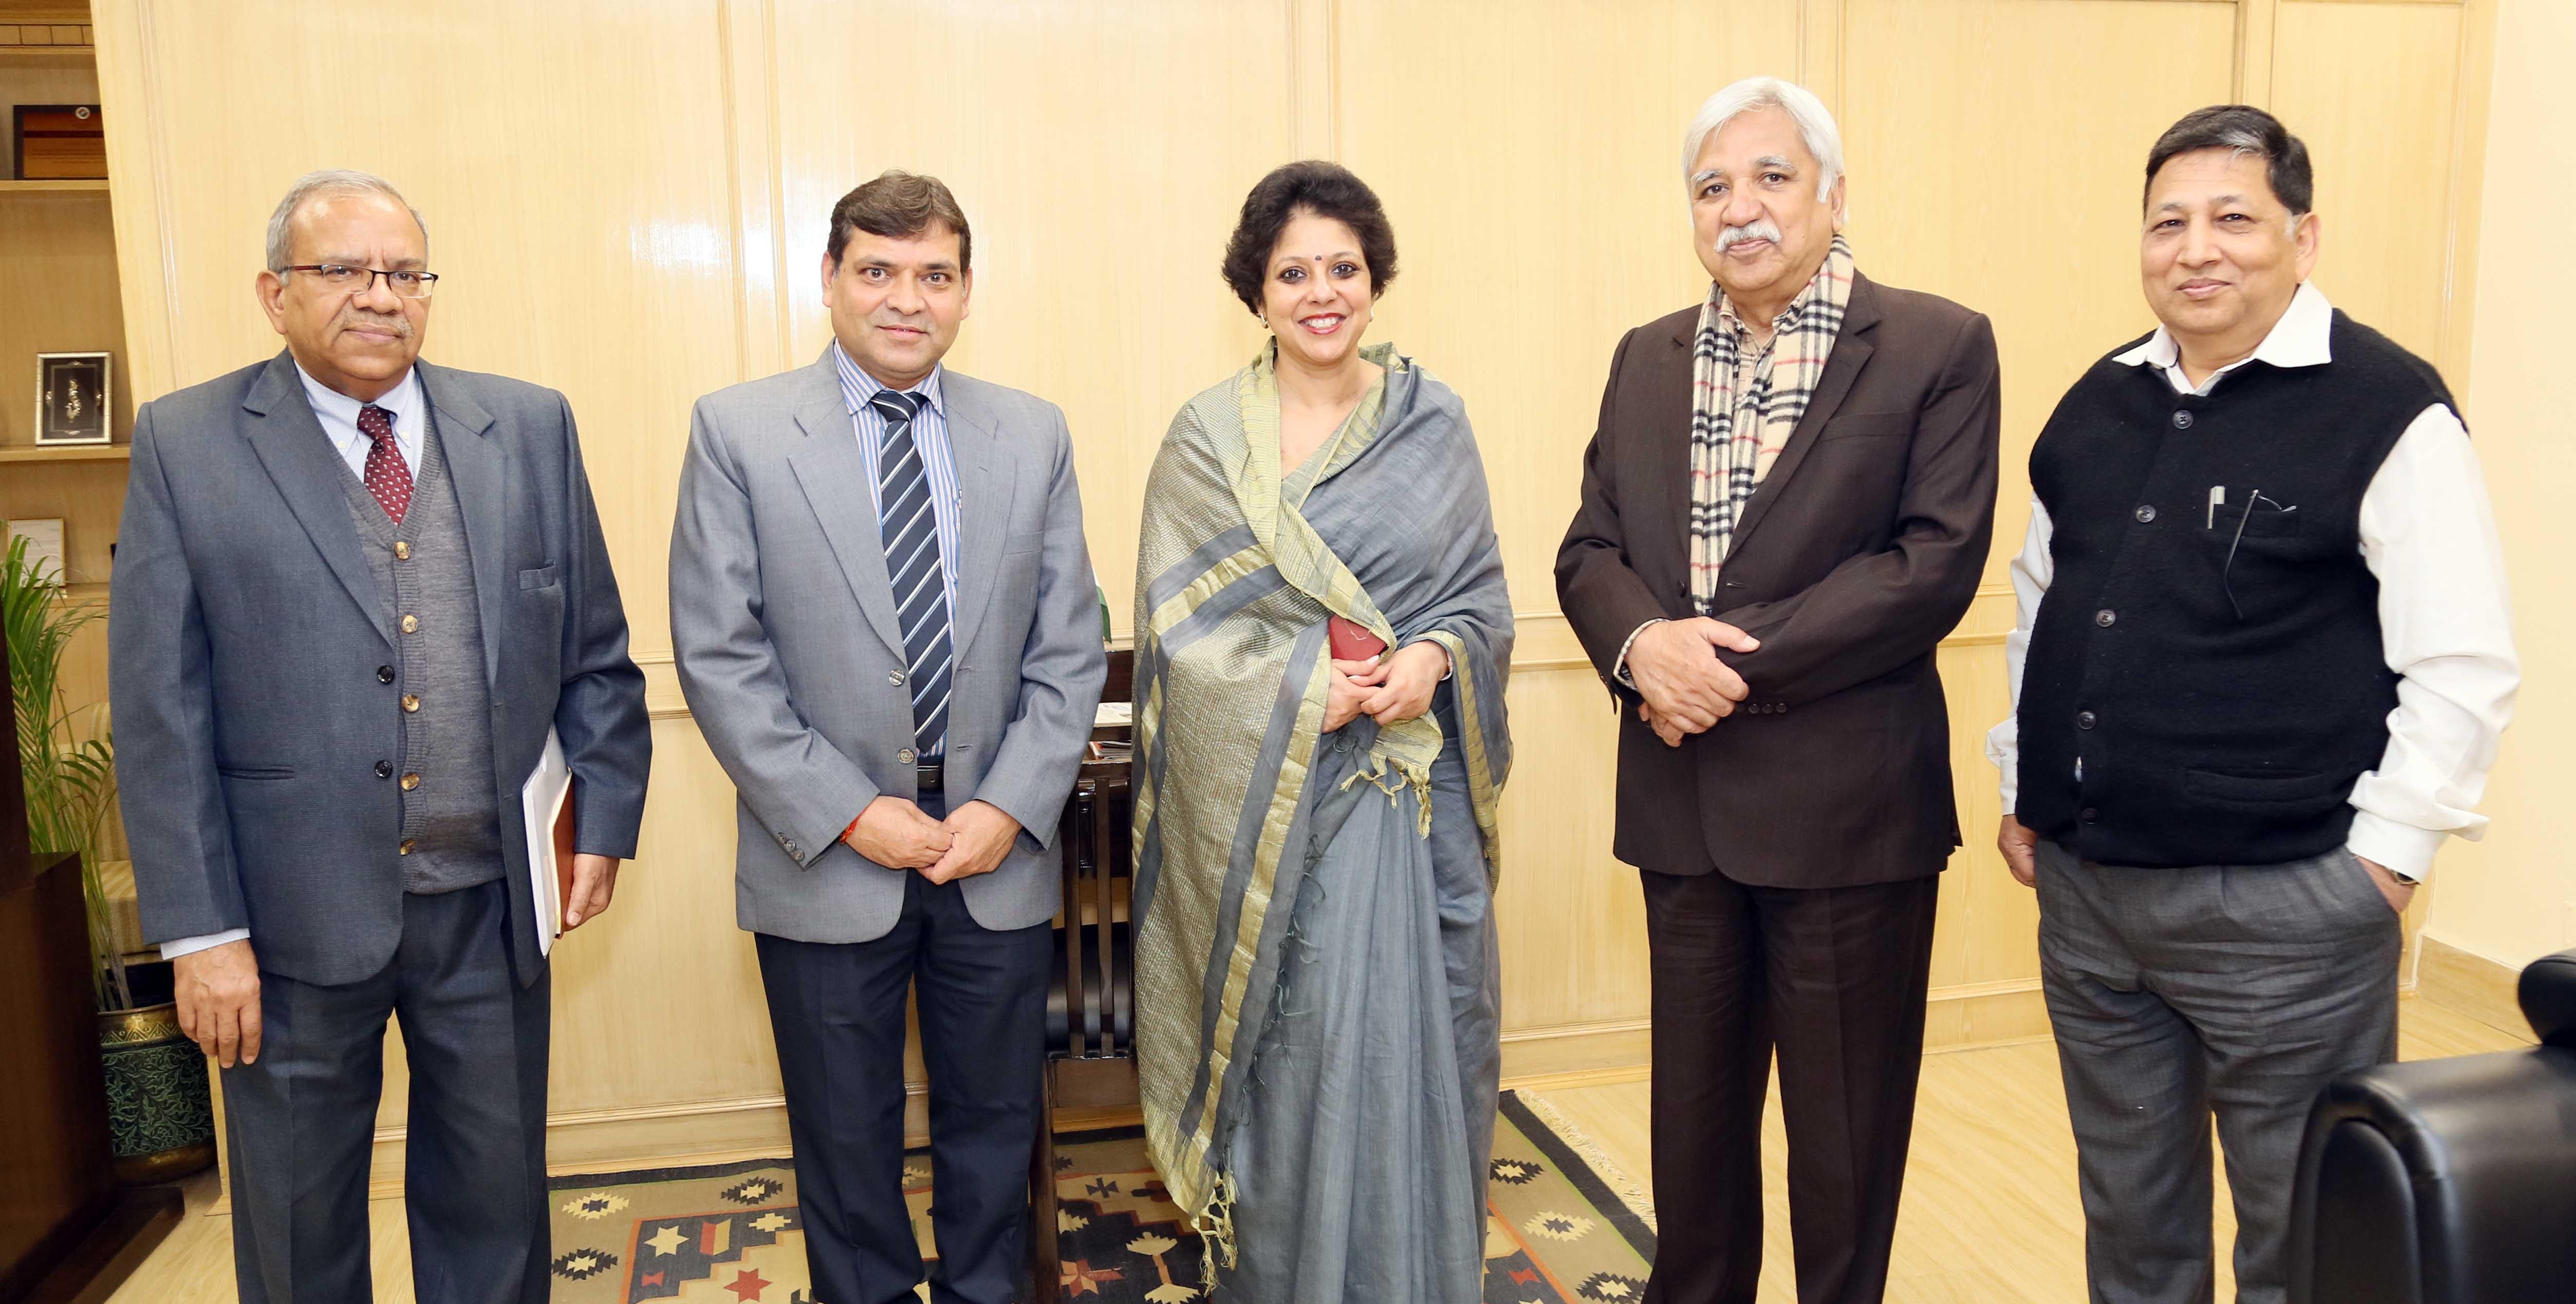 Ms. Shipra Verma, Chief Electoral Officer, Elections Manitoba, Canada, paid a courtesy call on Shri Sunil Arora, Hon'ble Chief Election Commissioner of India on 21 Feb 2020, at Nirvachan Sadan, New Delhi.